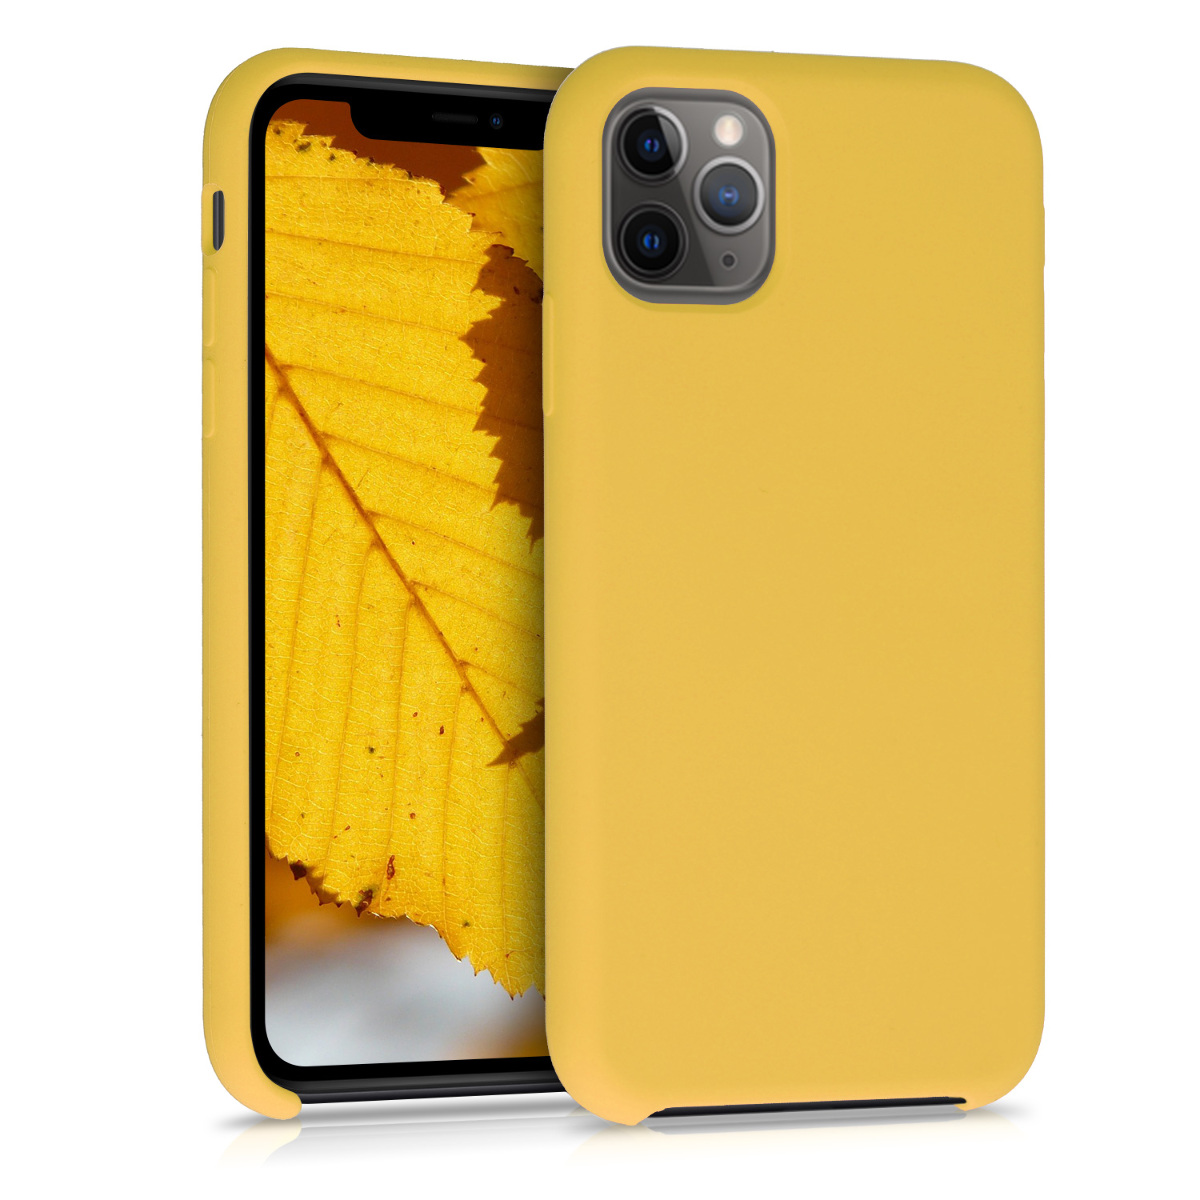 KW Θήκη Σιλικόνης Apple iPhone 11 Pro Max - Soft Flexible Rubber - Honey Yellow (49725.143)